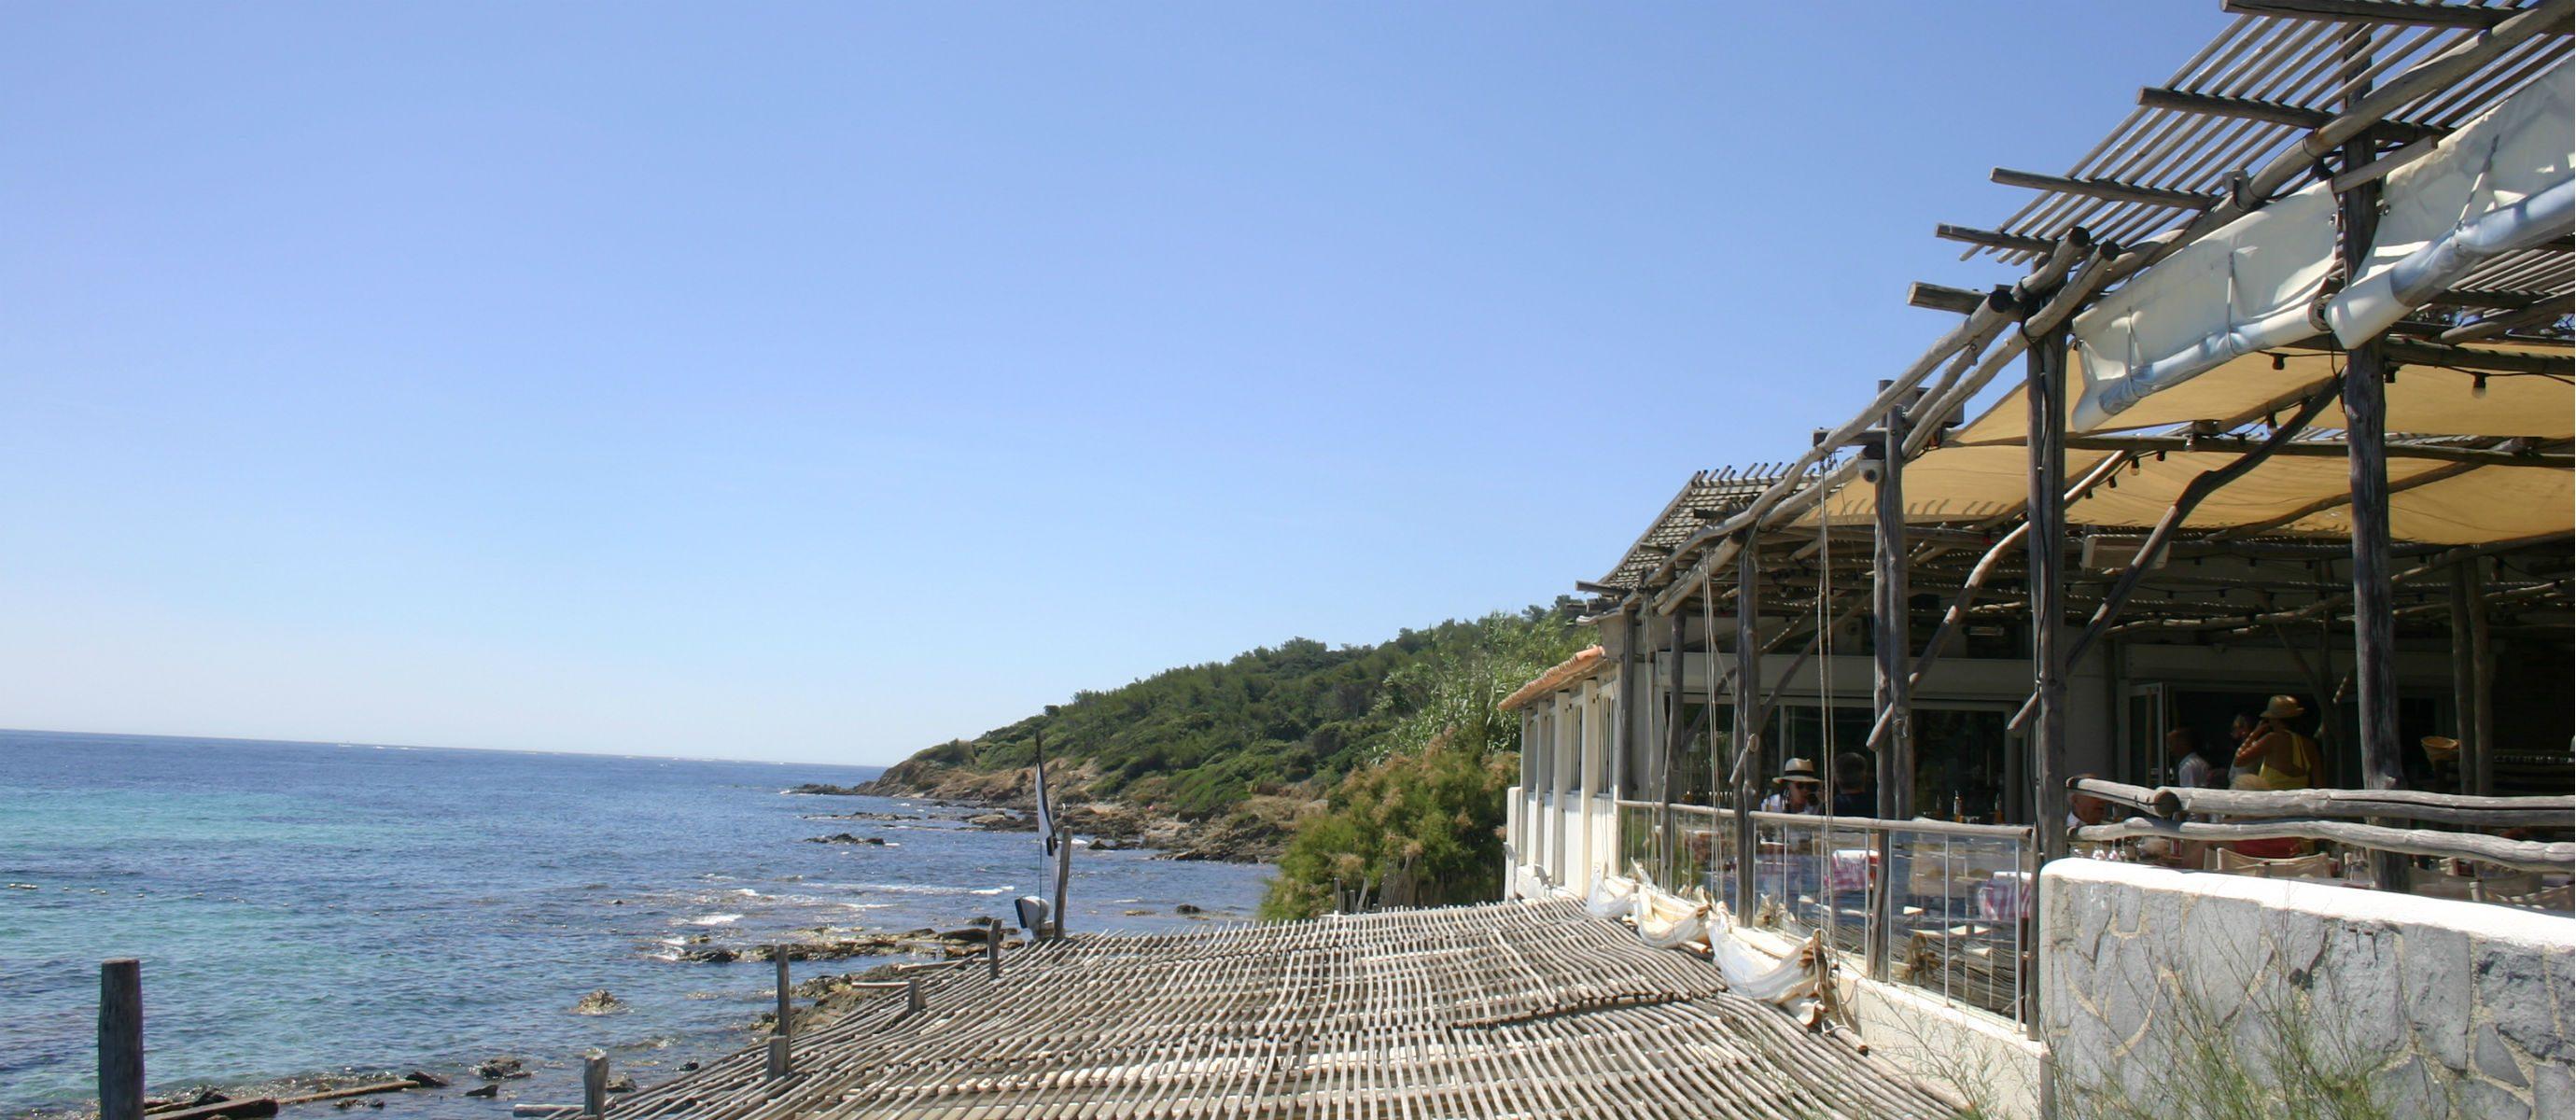 MR. Beach 2. IMG_2422